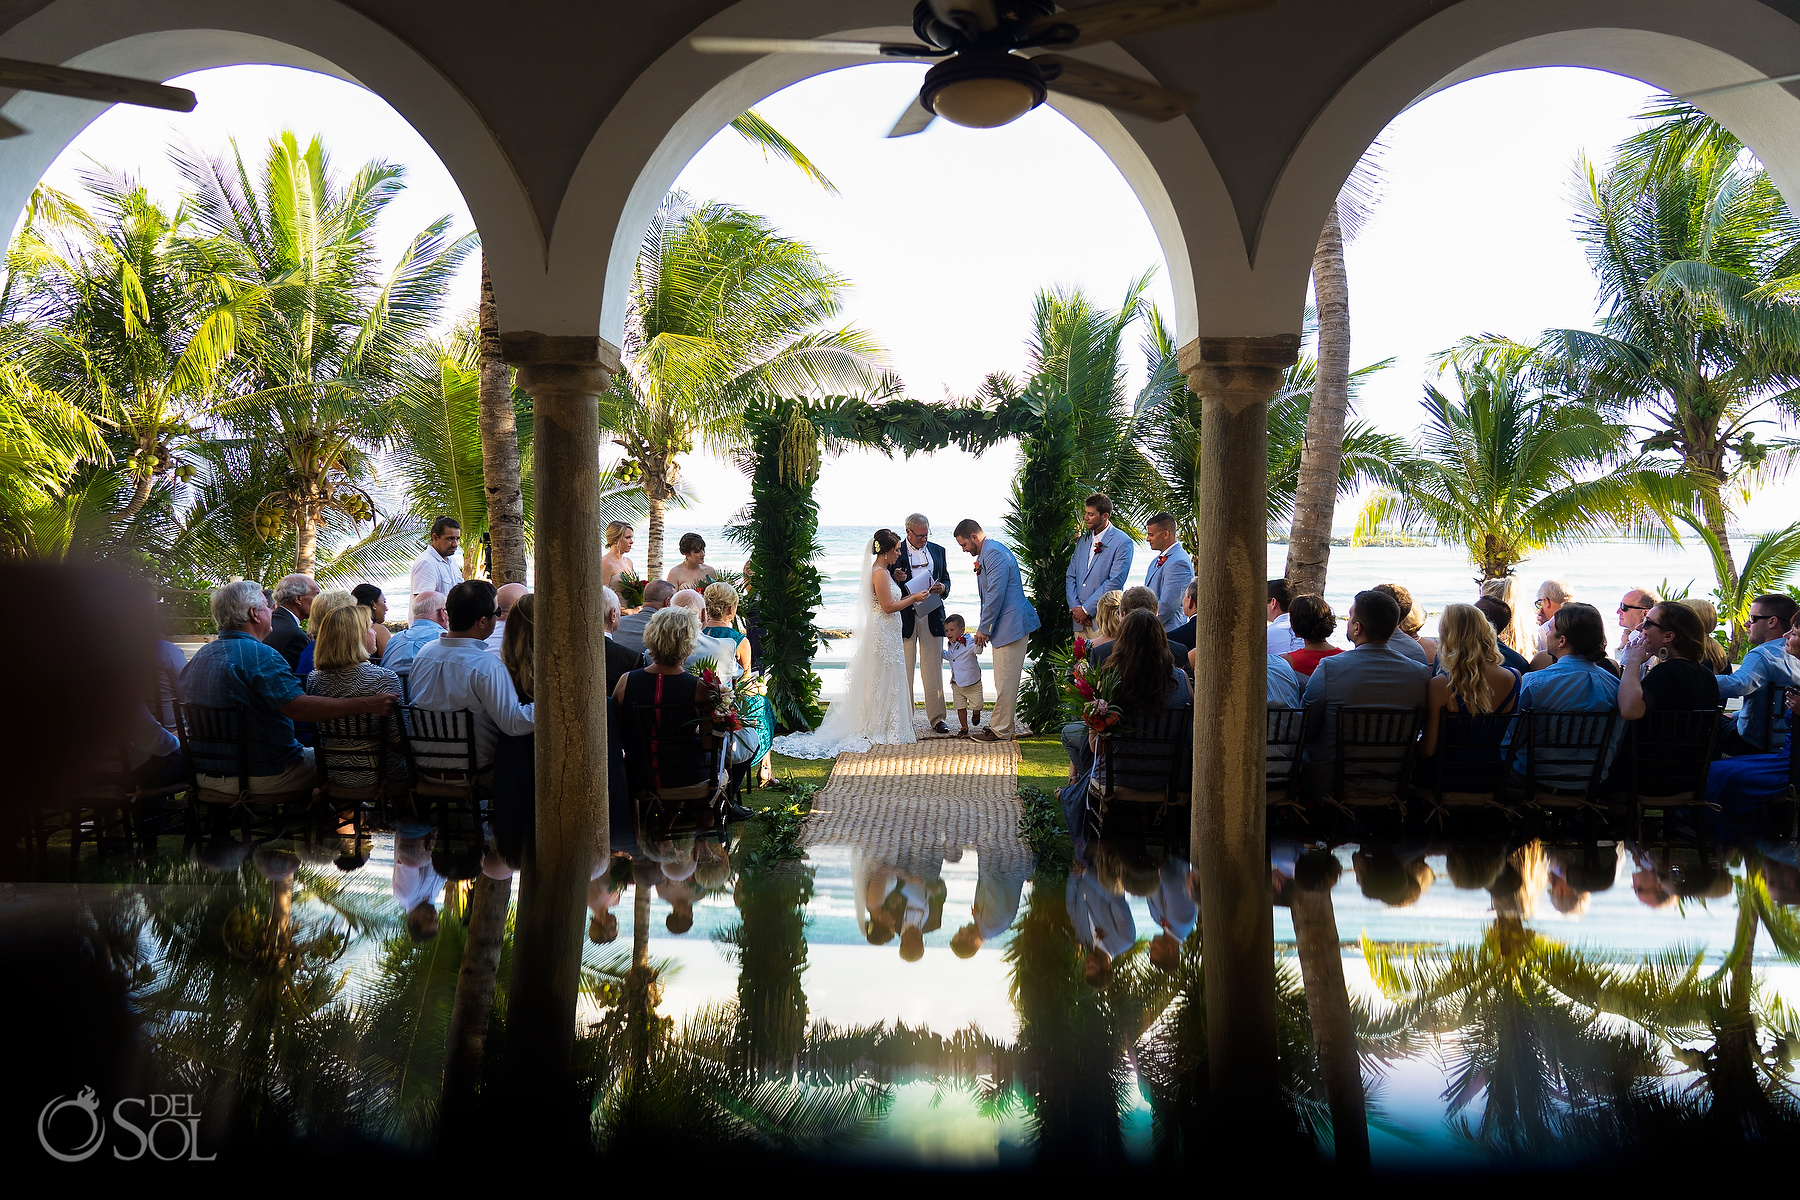 Photo reflection Hacienda Corazon BeachFront Ceremony Green decoration ideas riviera maya villa wedding